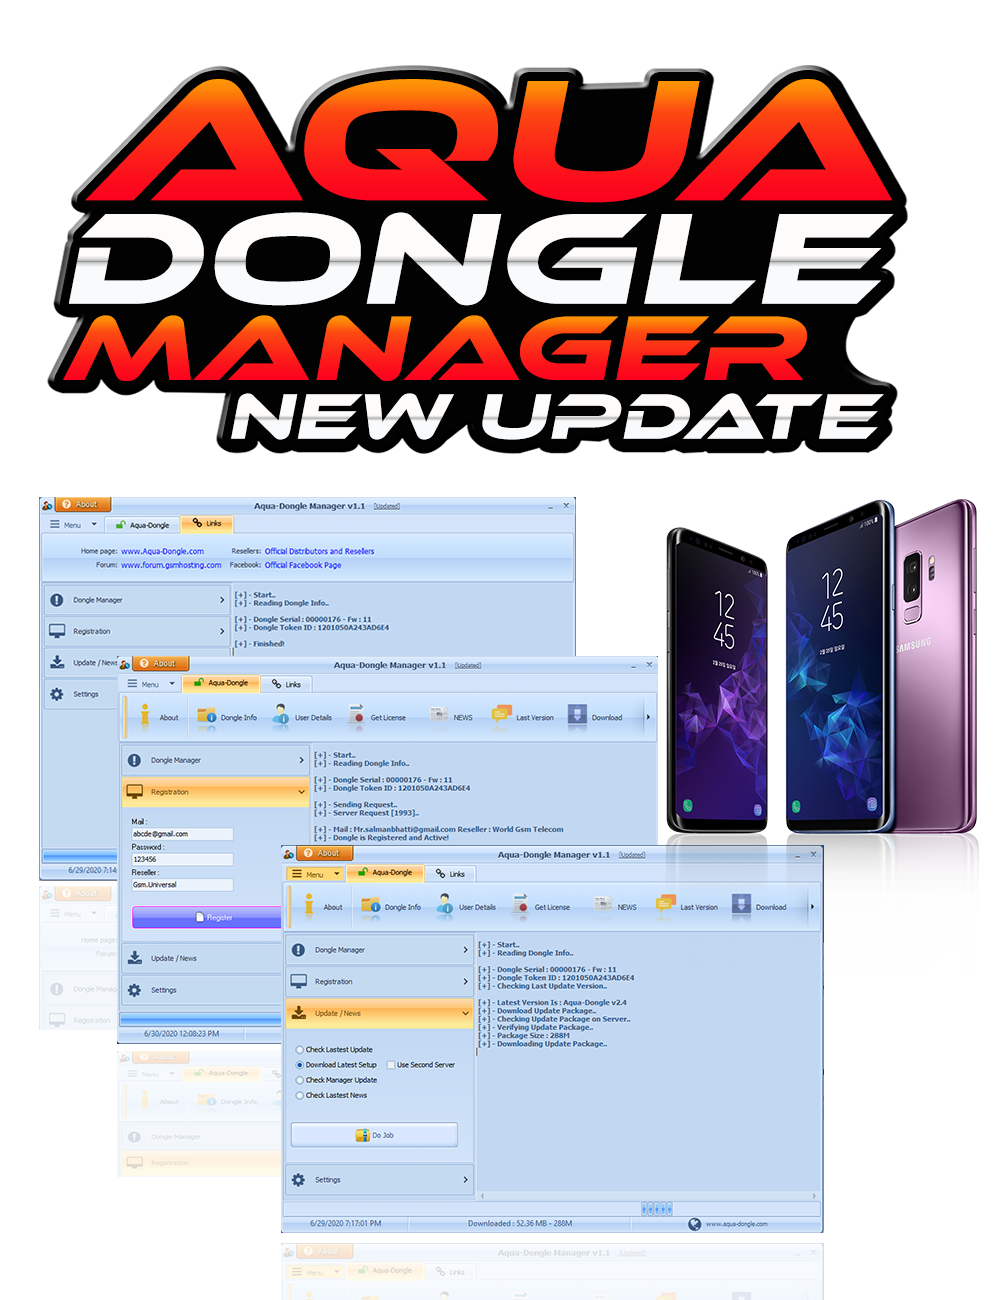 AQUA Dongle Manager V1.1 Second Server & Other Improvement Update Released 30/06/2020